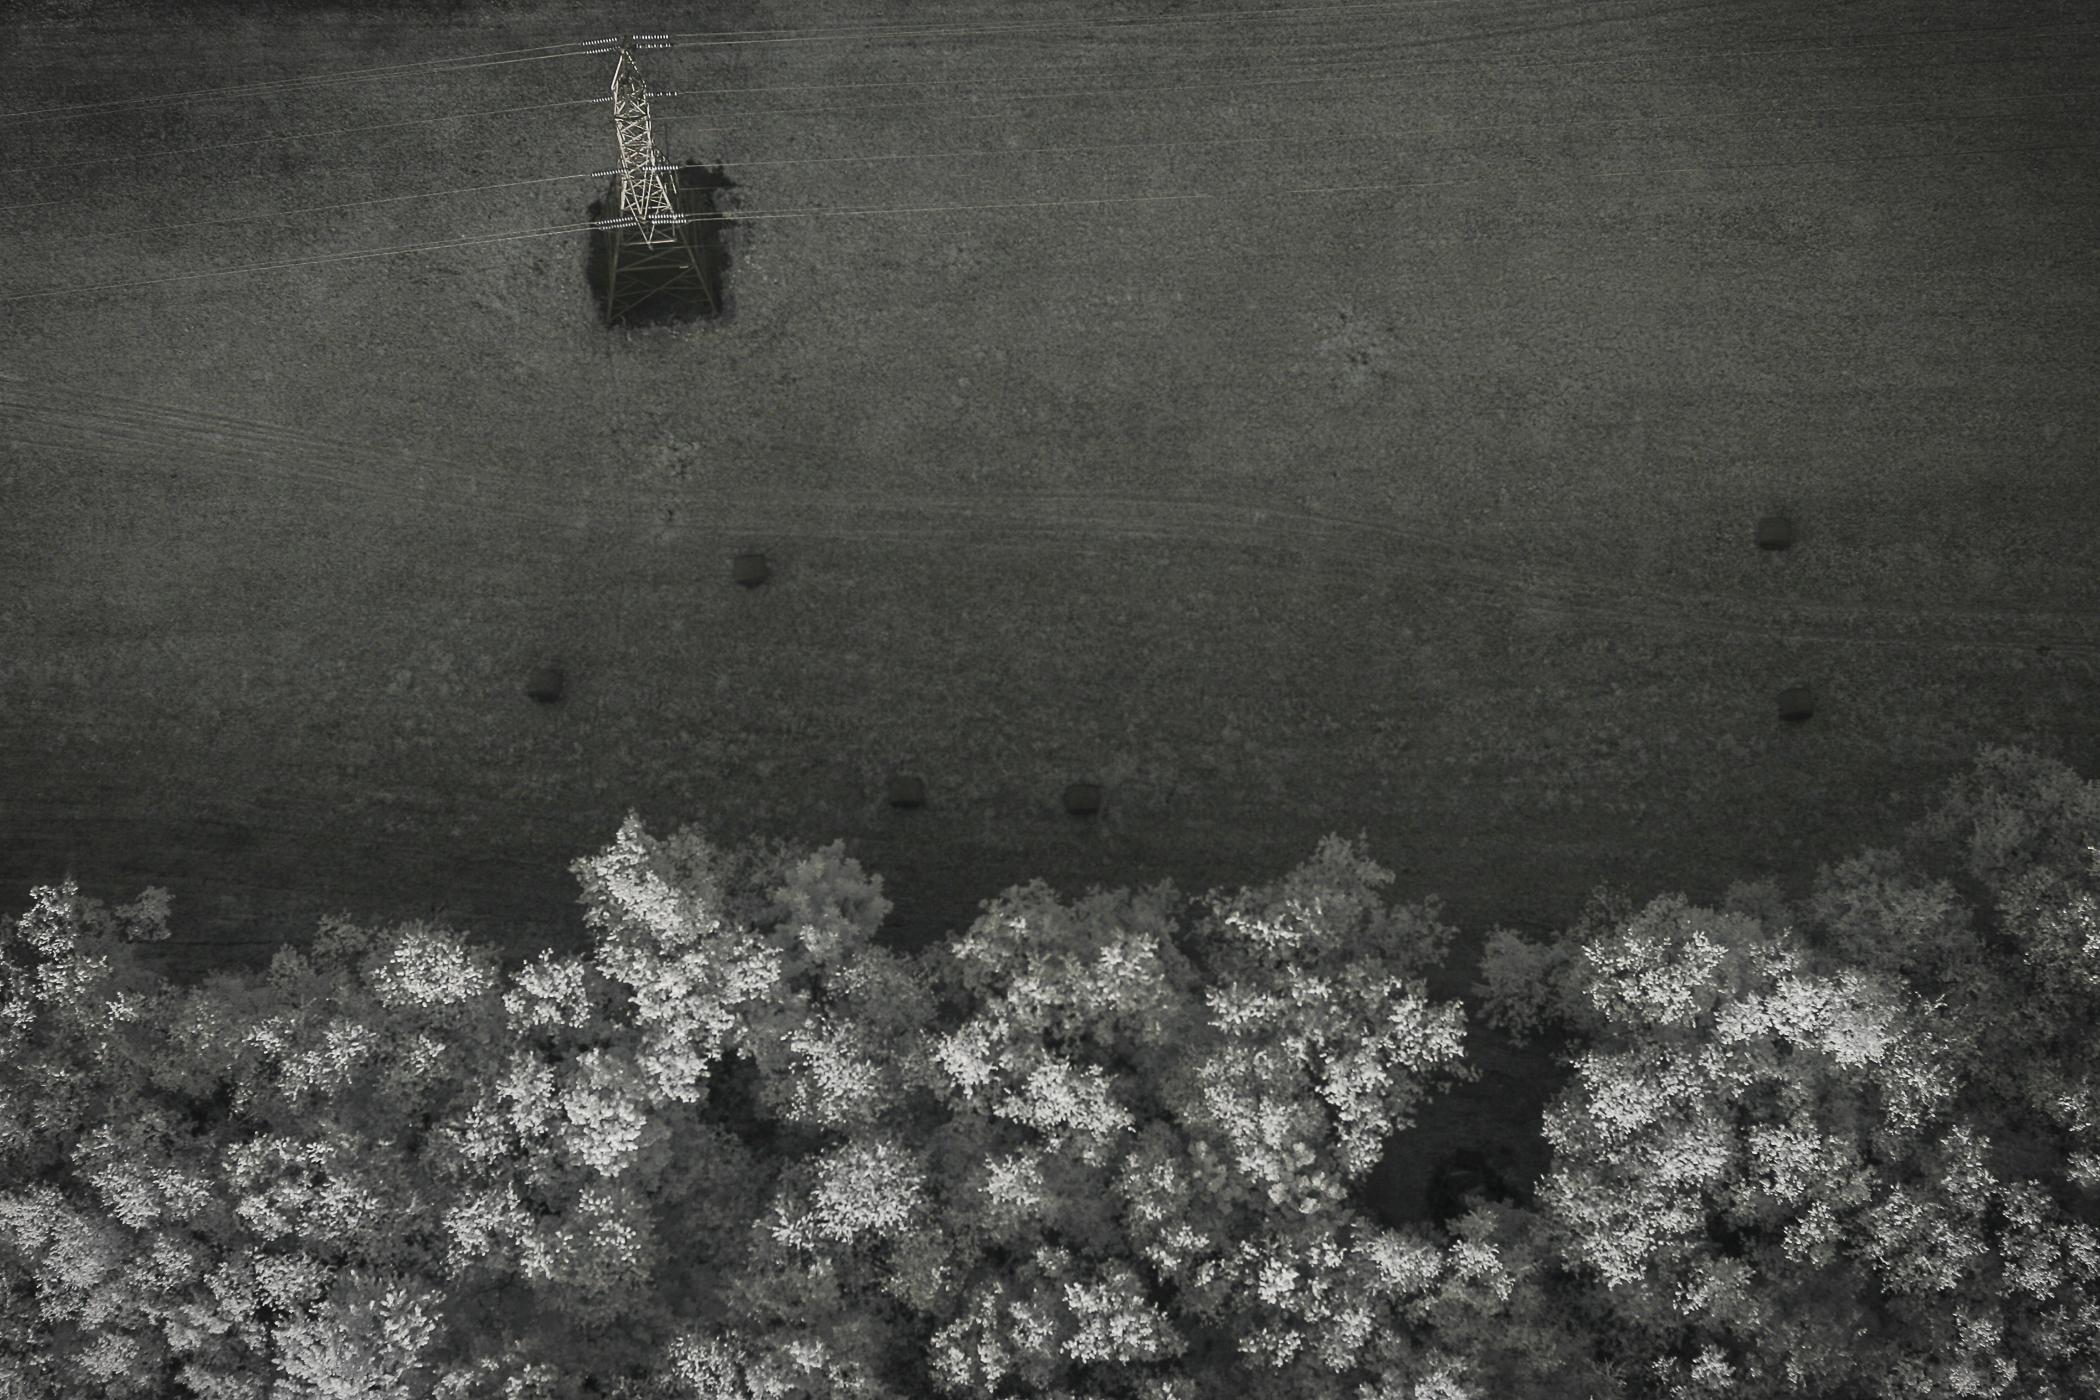 KendallInfraredAerial-11.jpg